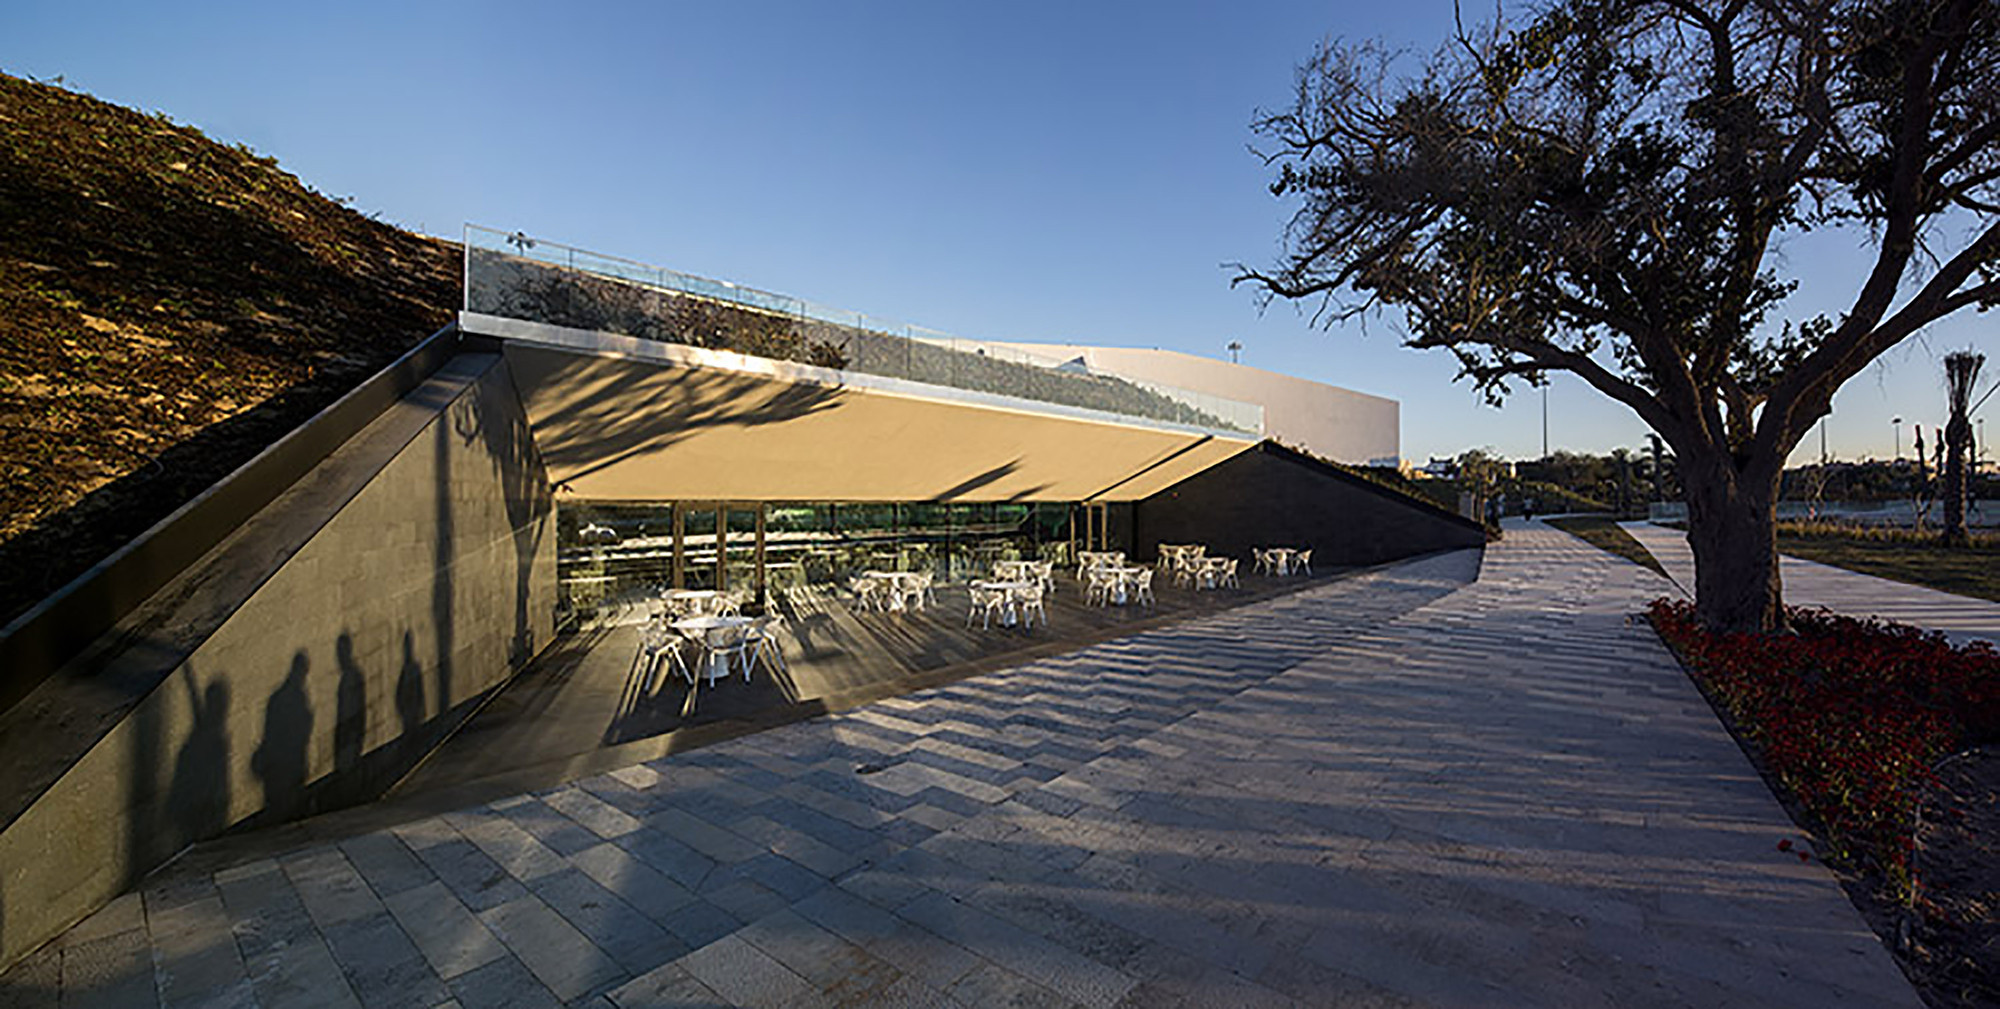 Gallery of al shaheed park ricardo camacho 7 for Garden design kuwait